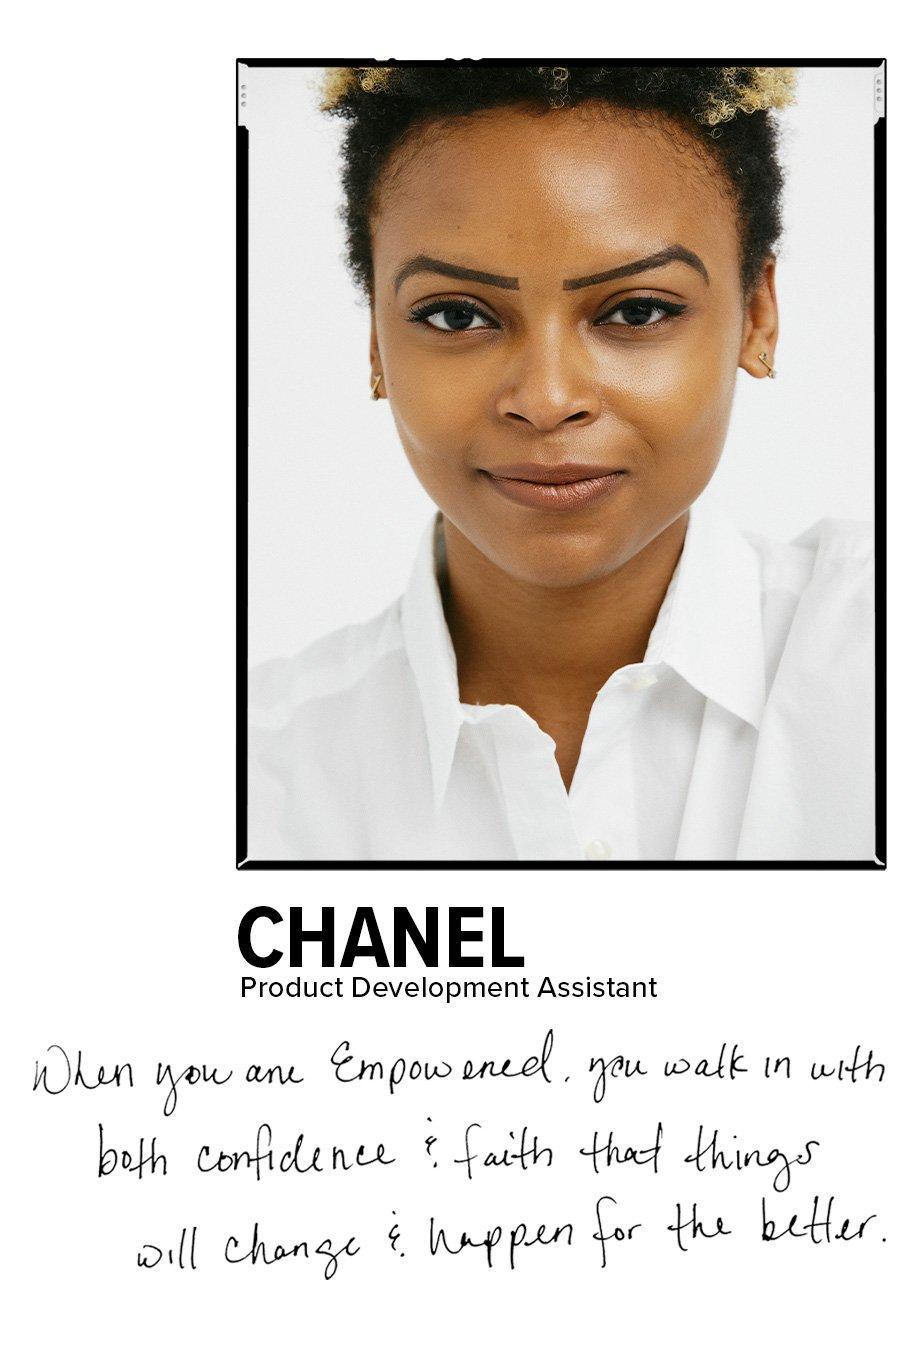 Chanel - Product Development Assistant